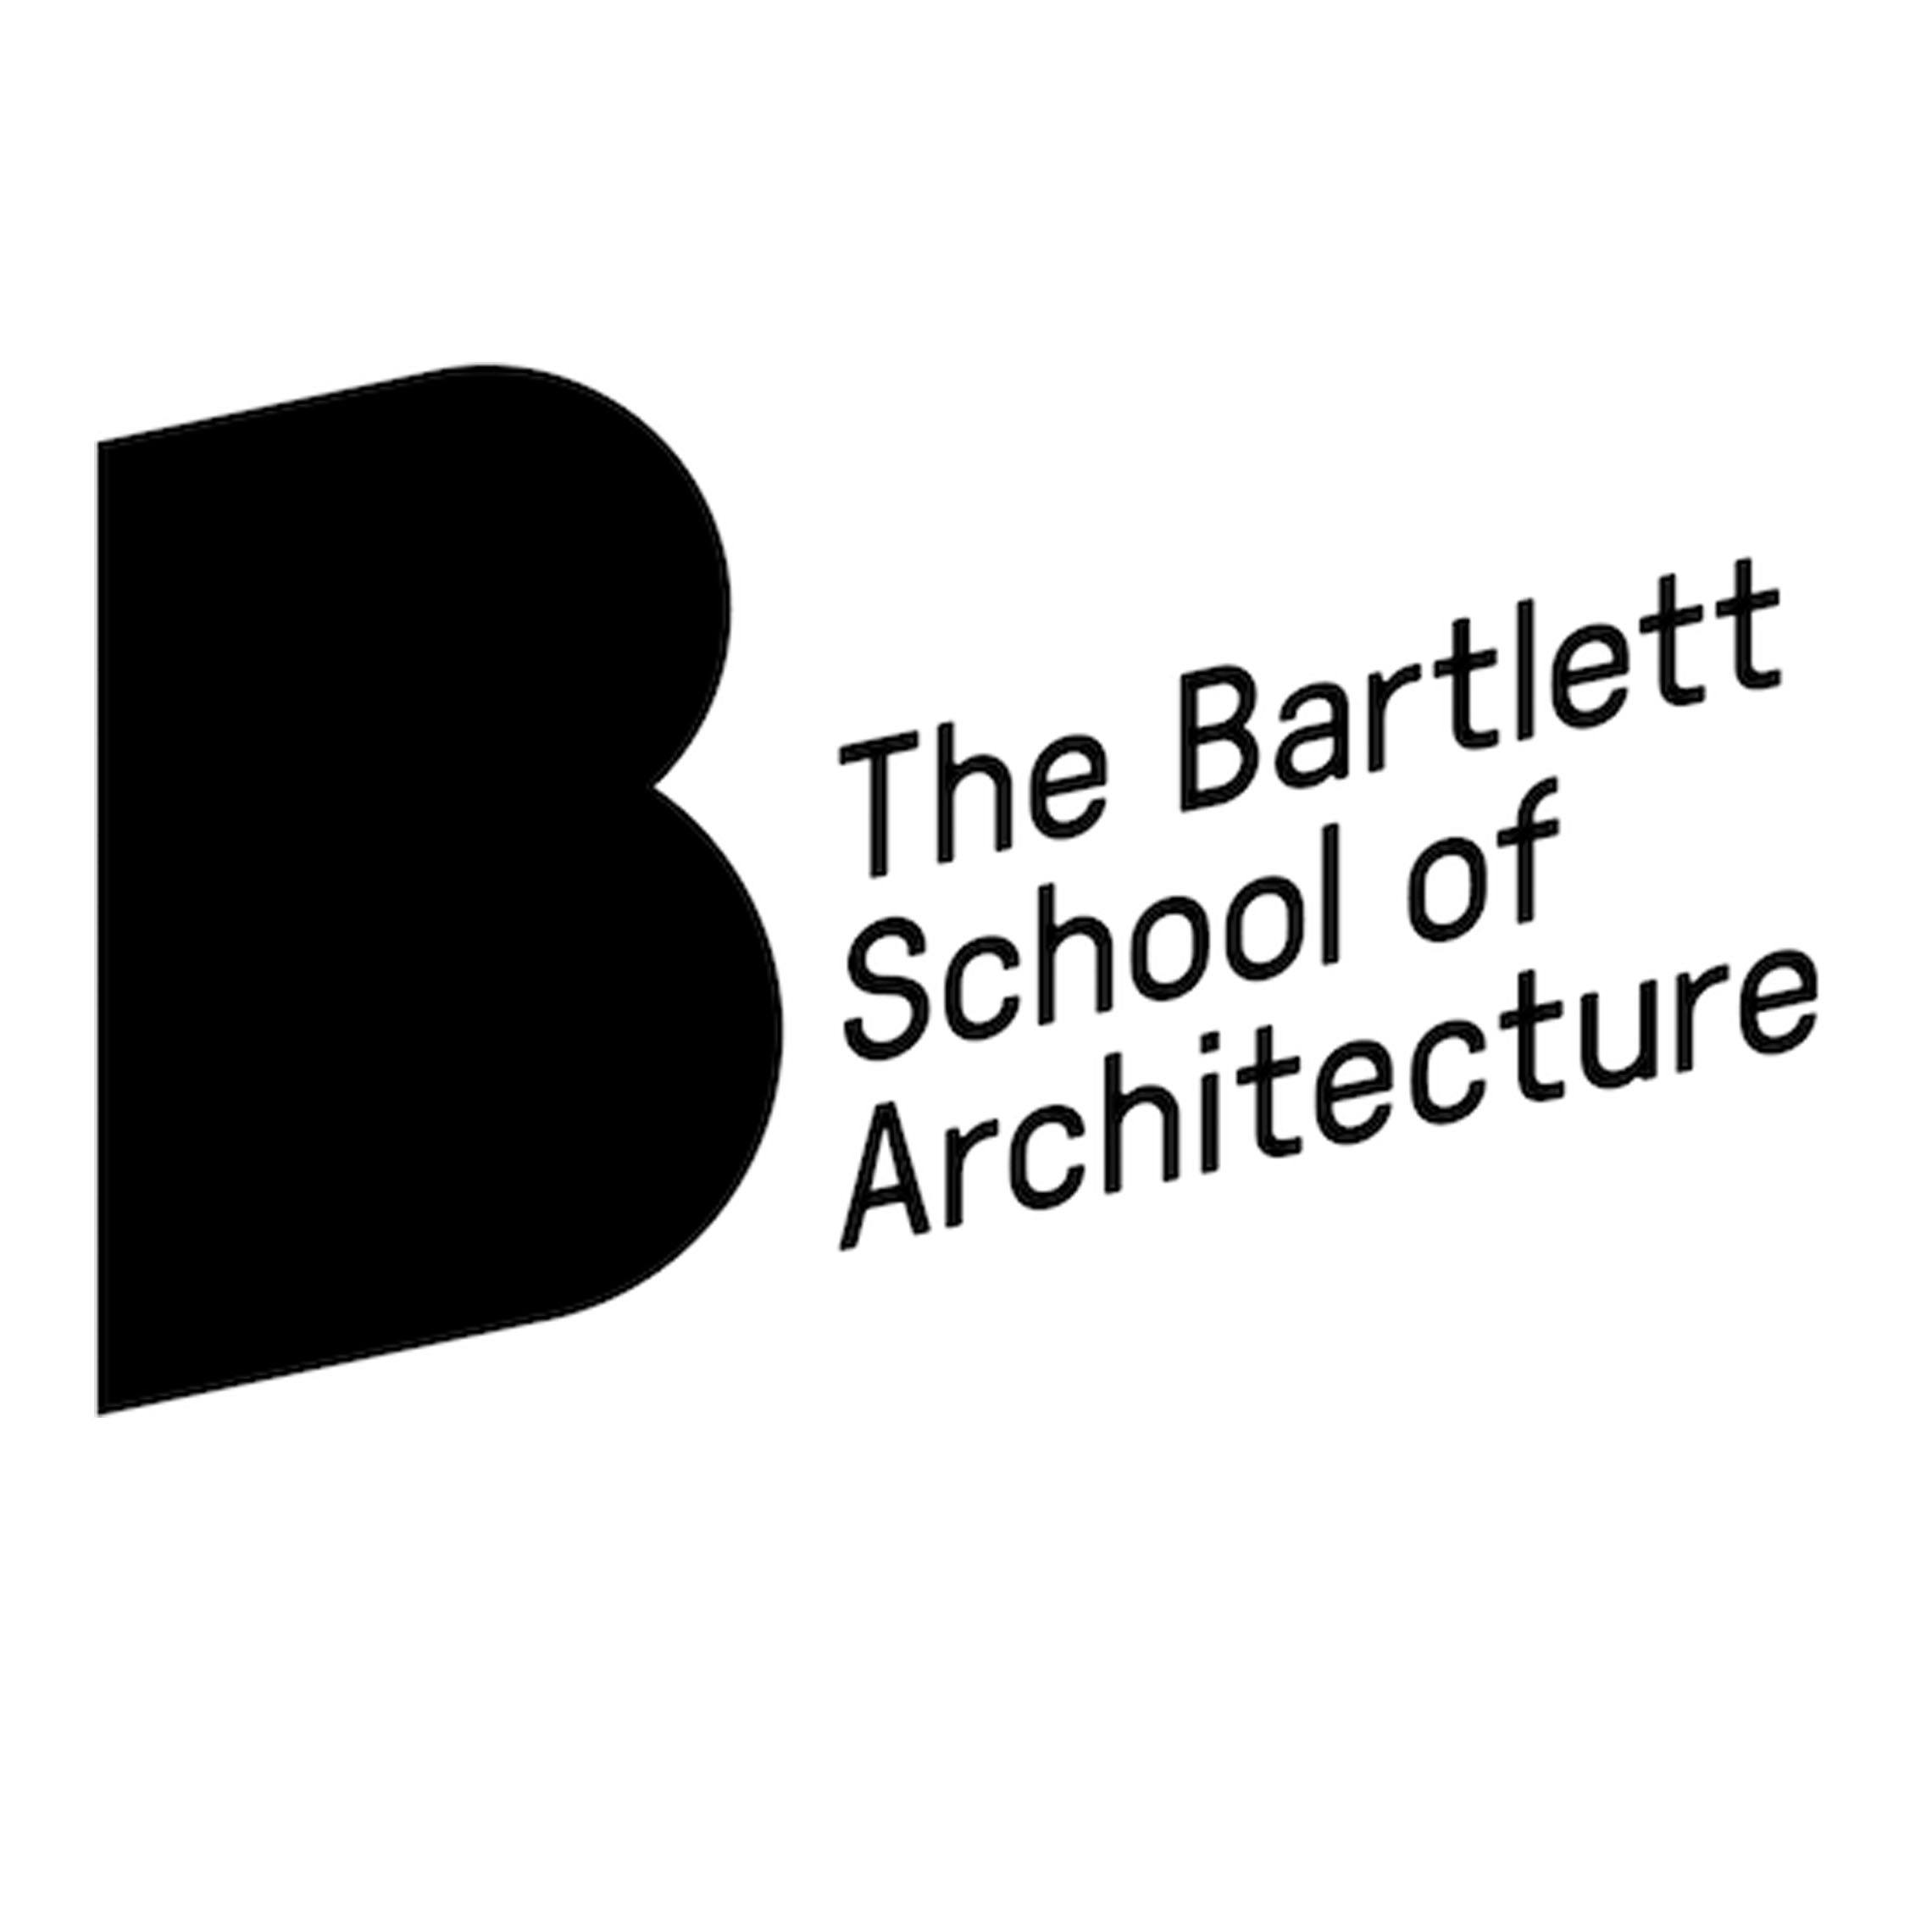 The Bartlett School of Architecture Organisation logo